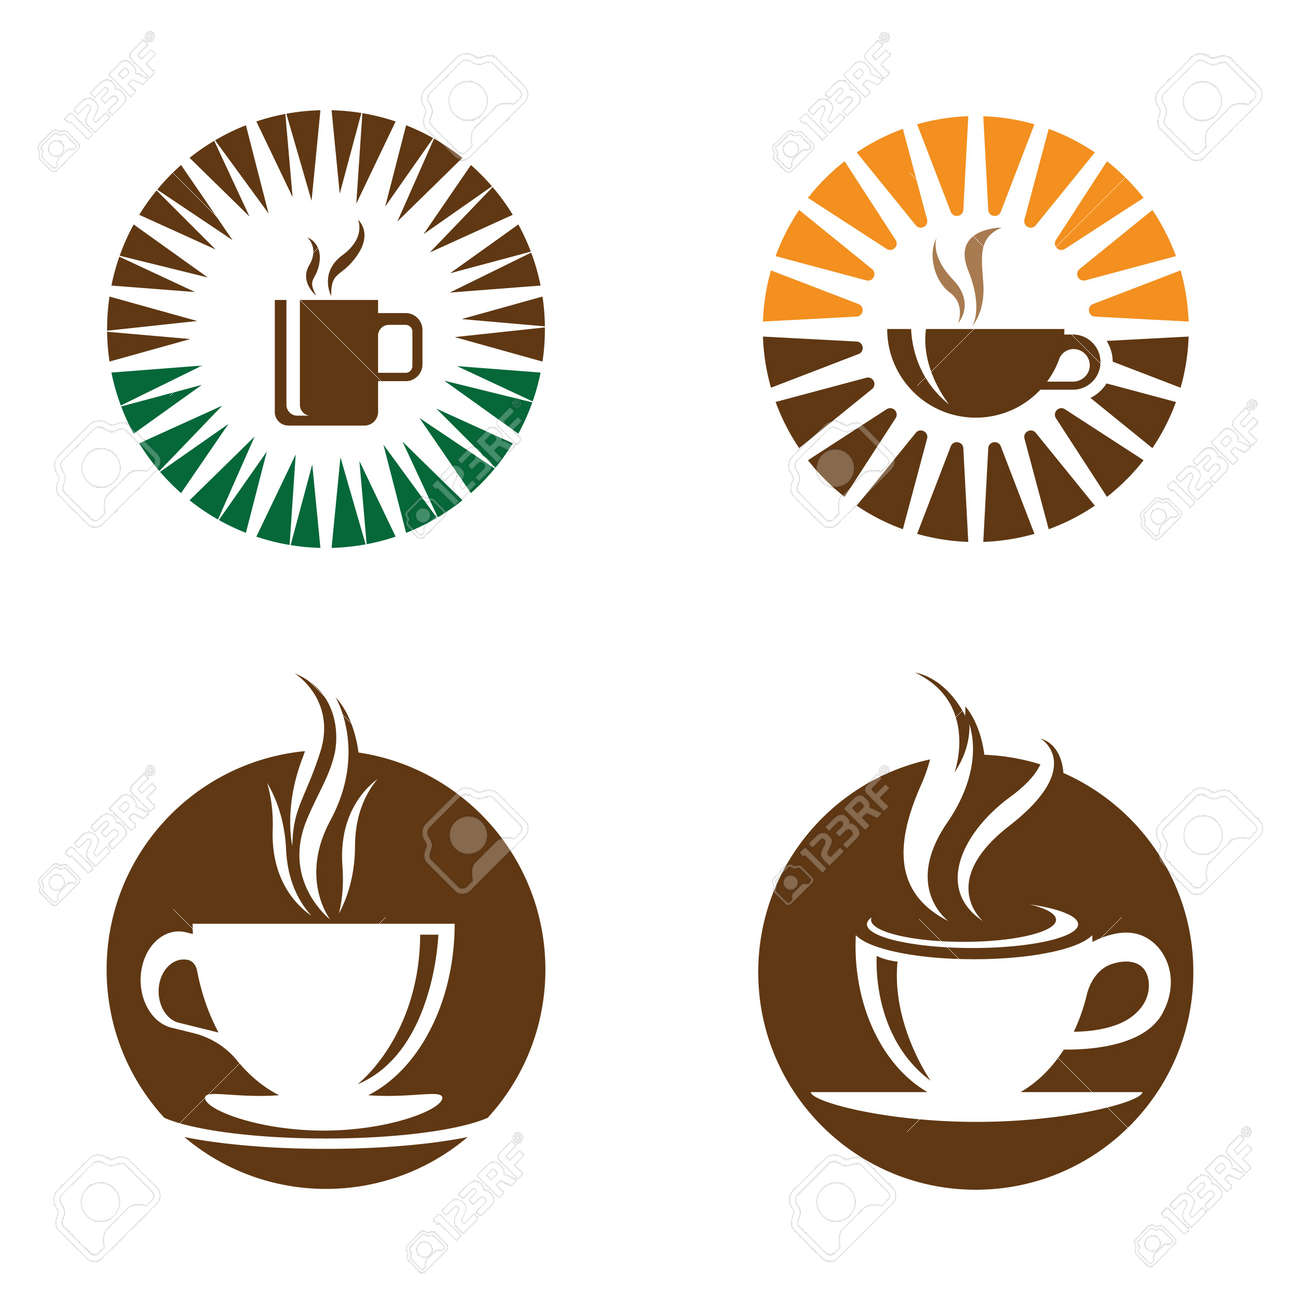 Coffee cup logo images illustration design - 173289147